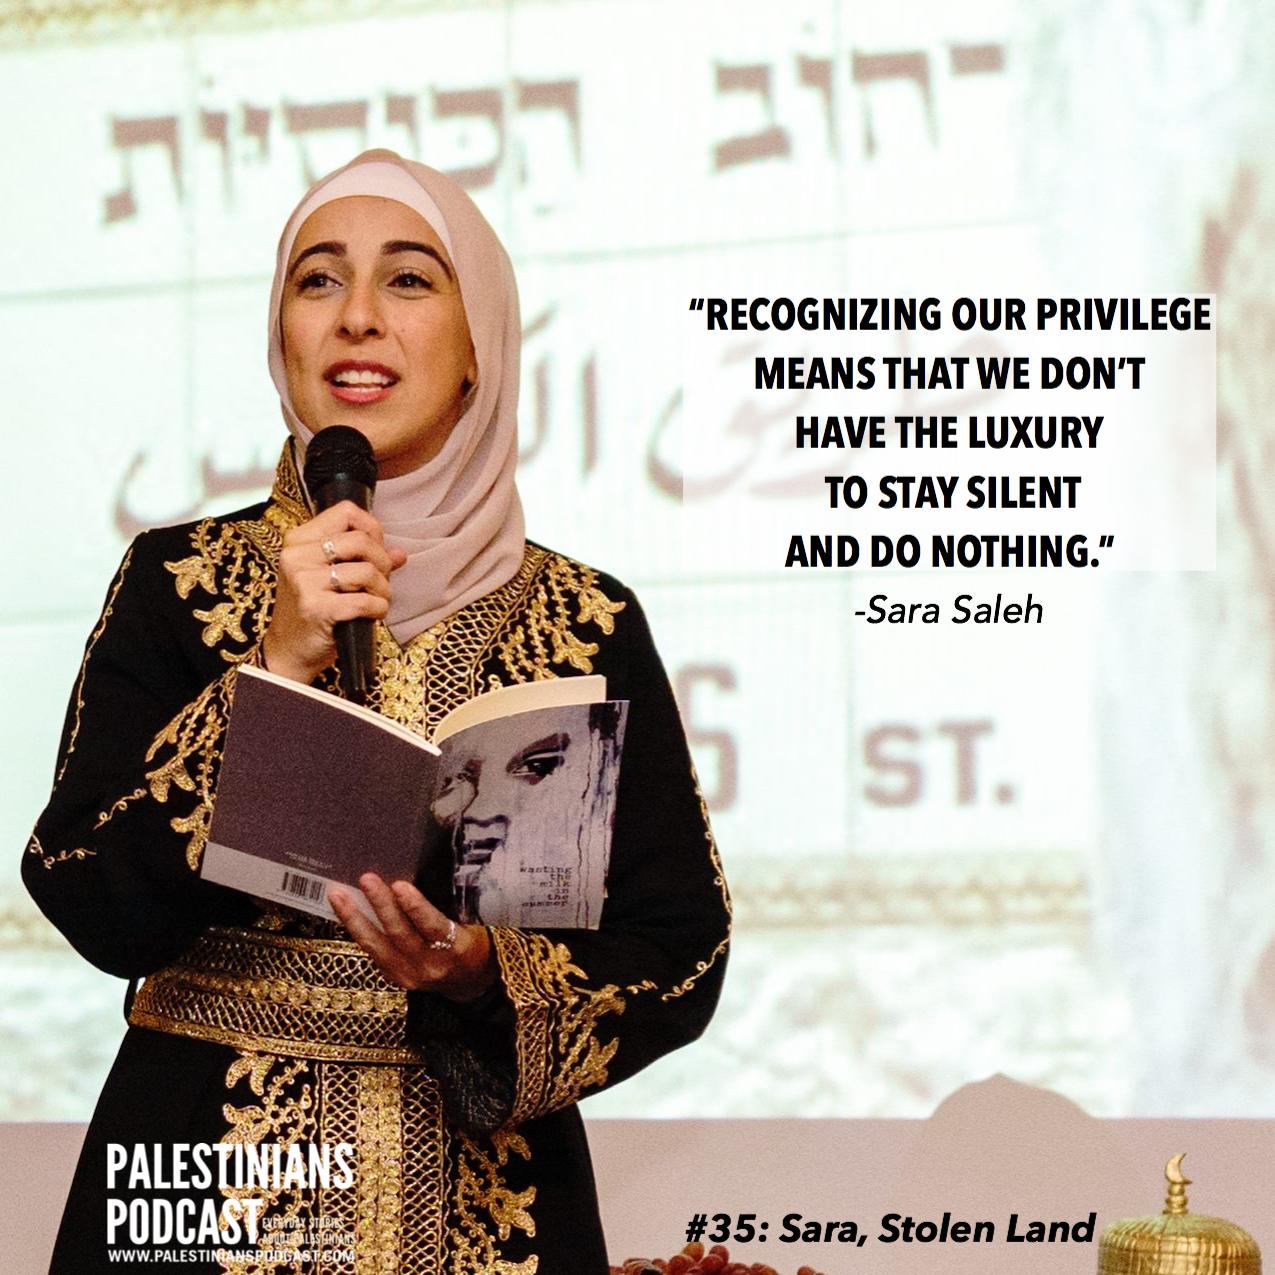 Sarasaleh-2.jpg